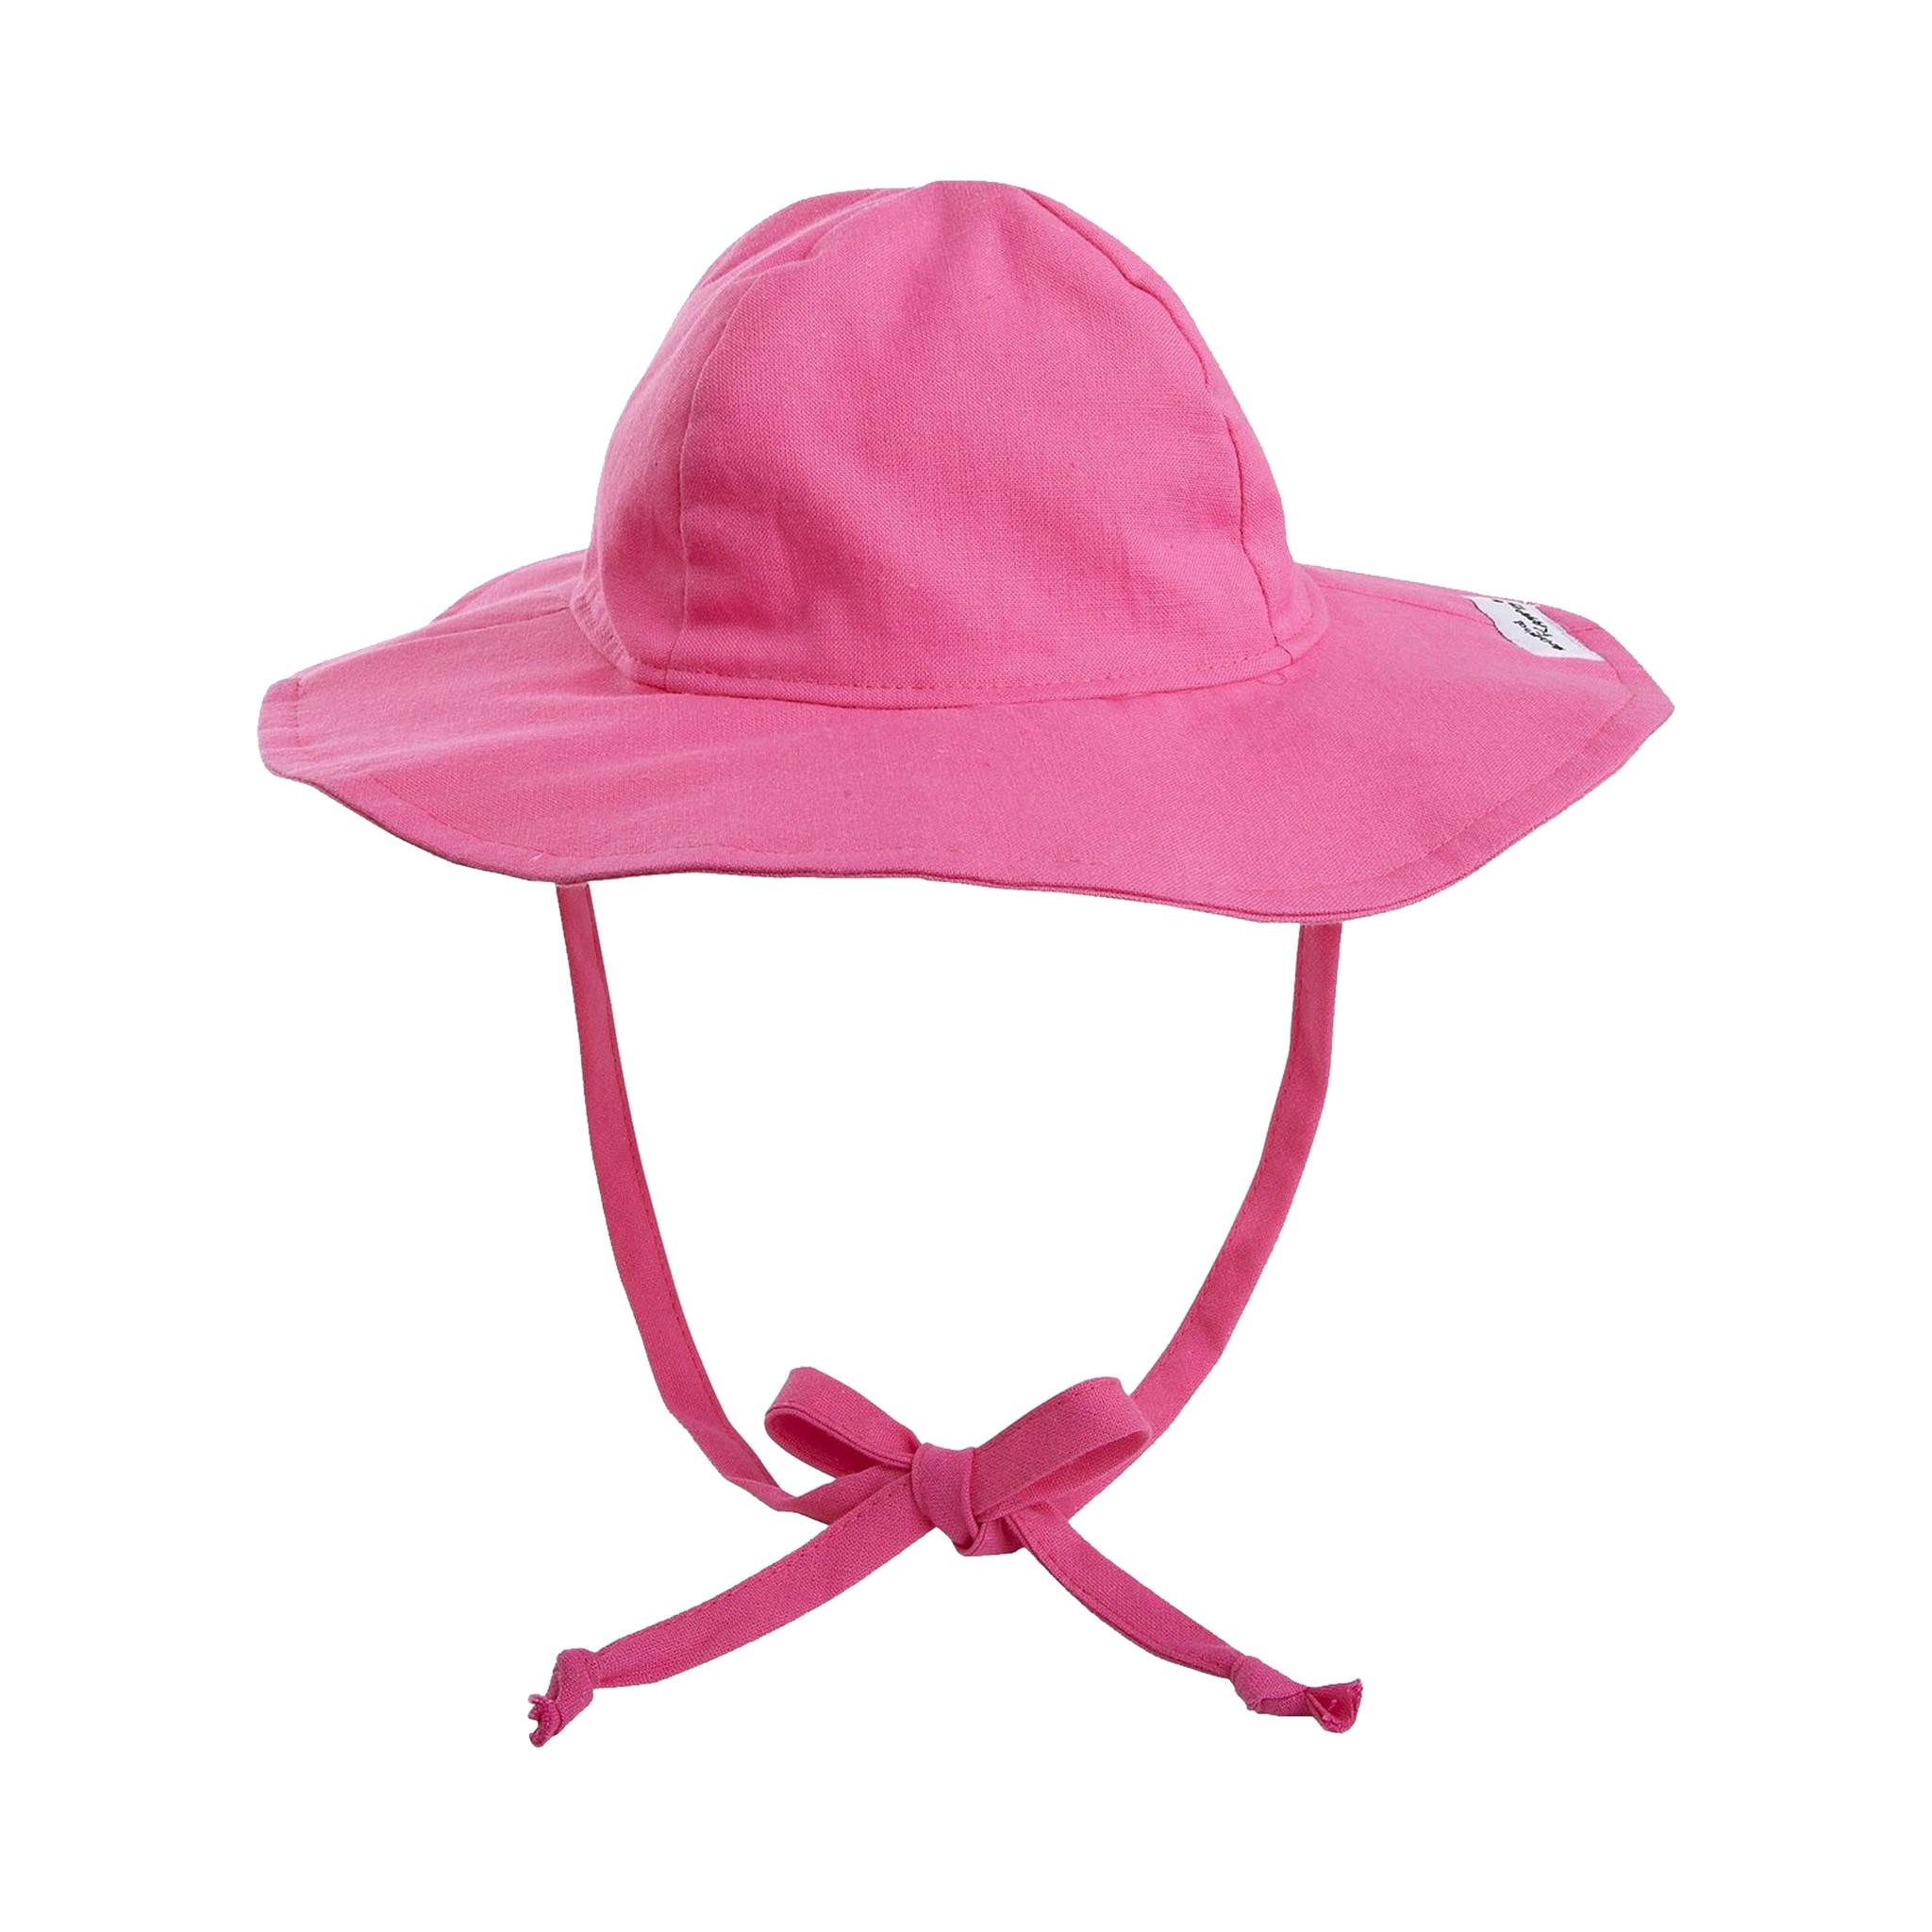 Flap Happy Hot Pink Floppy Sun Hat